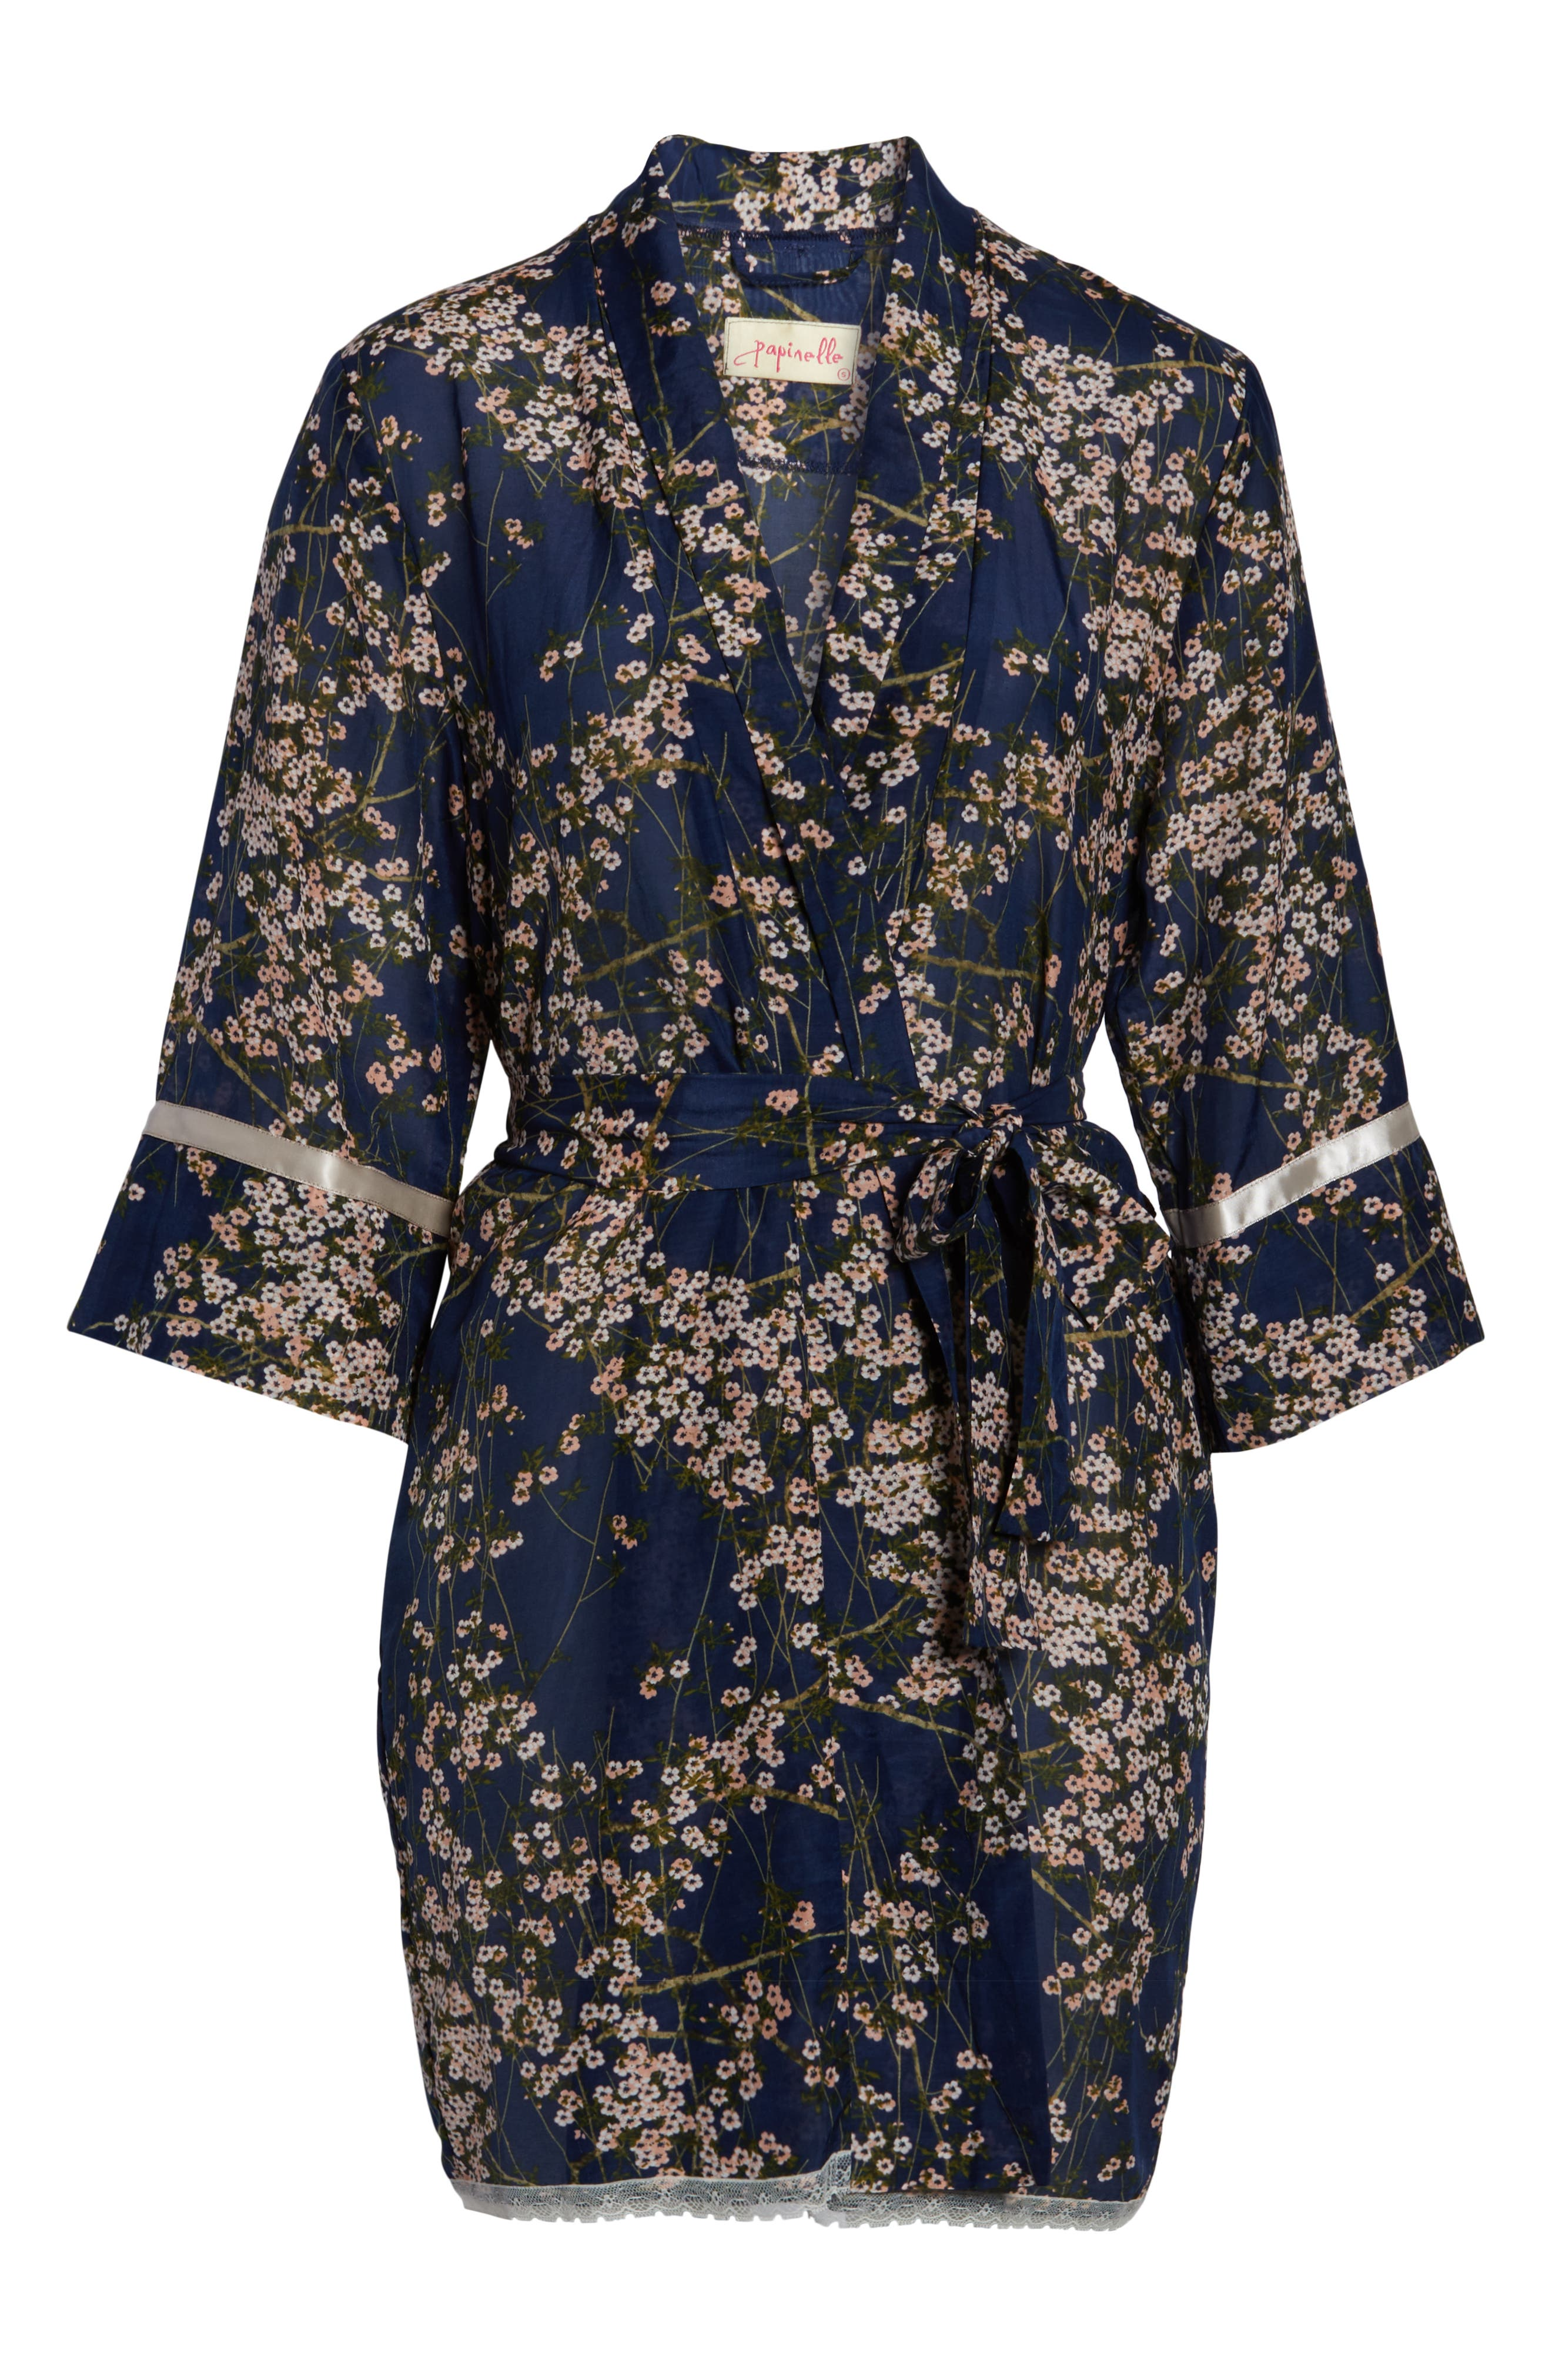 PAPINELLE, Cherry Blossom Short Robe, Alternate thumbnail 6, color, NAVY